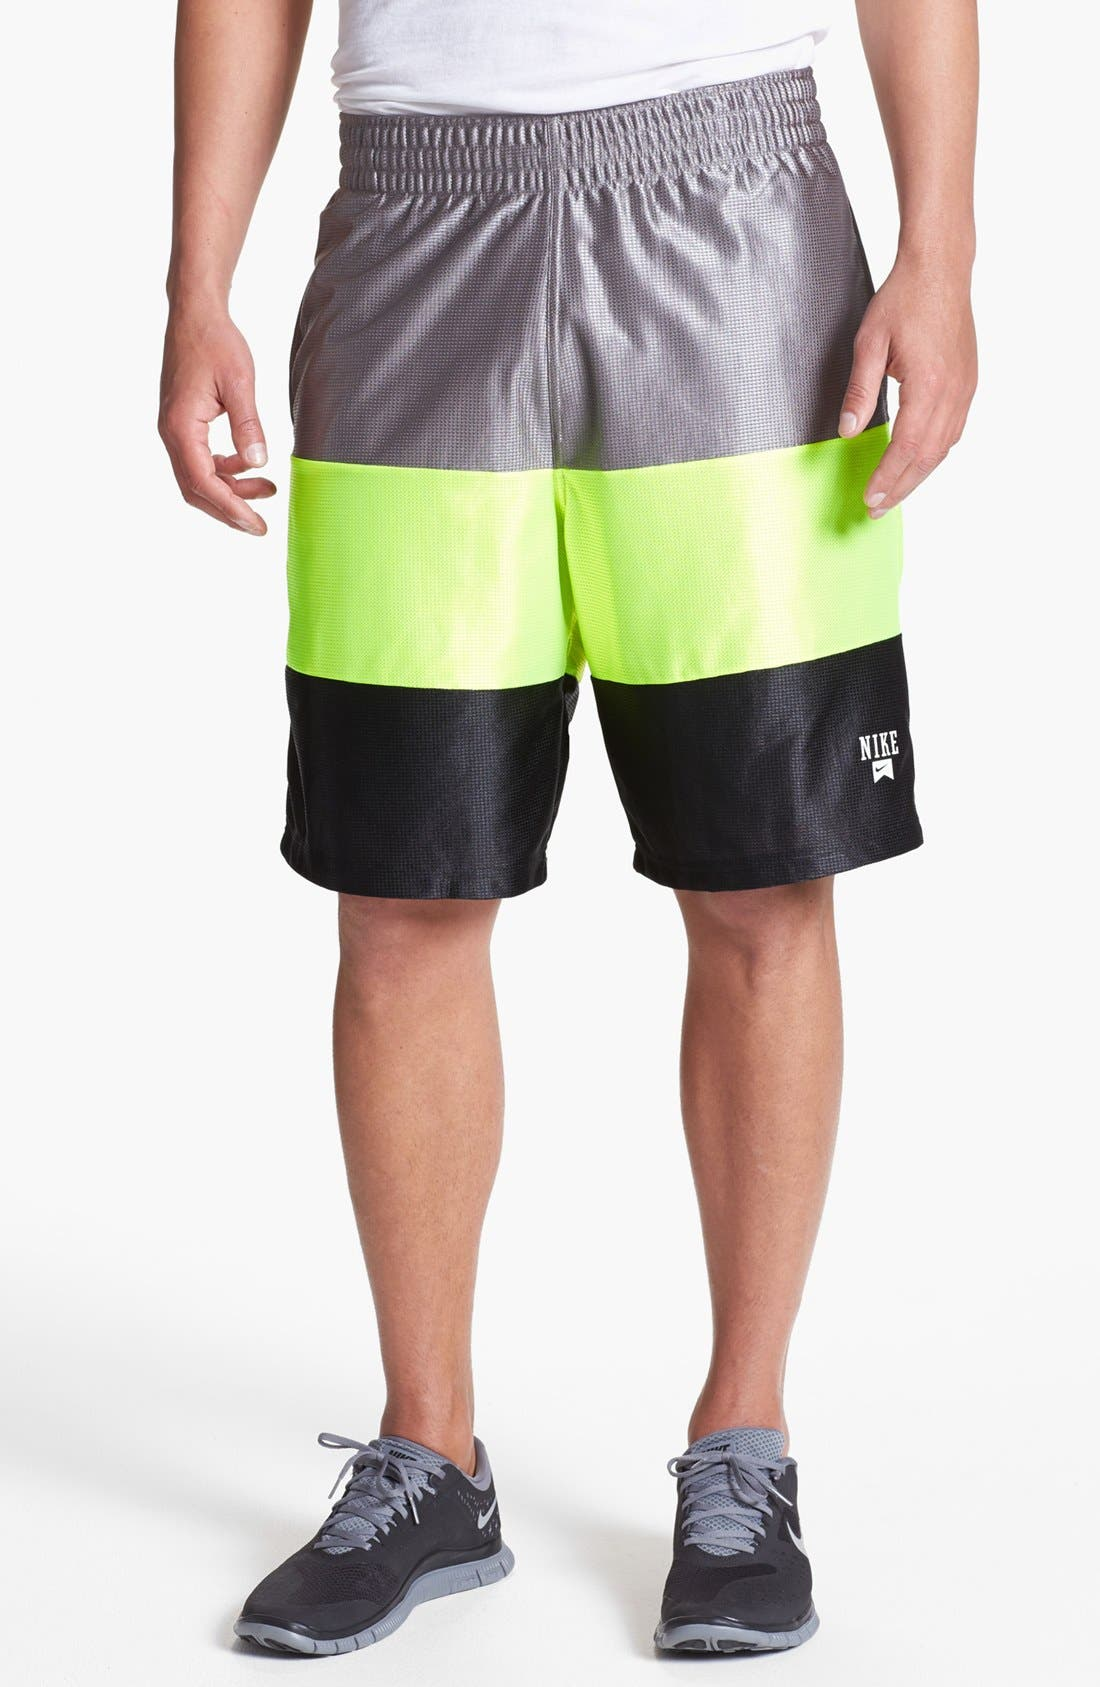 Alternate Image 1 Selected - Nike 'Baller' Mesh Athletic Shorts